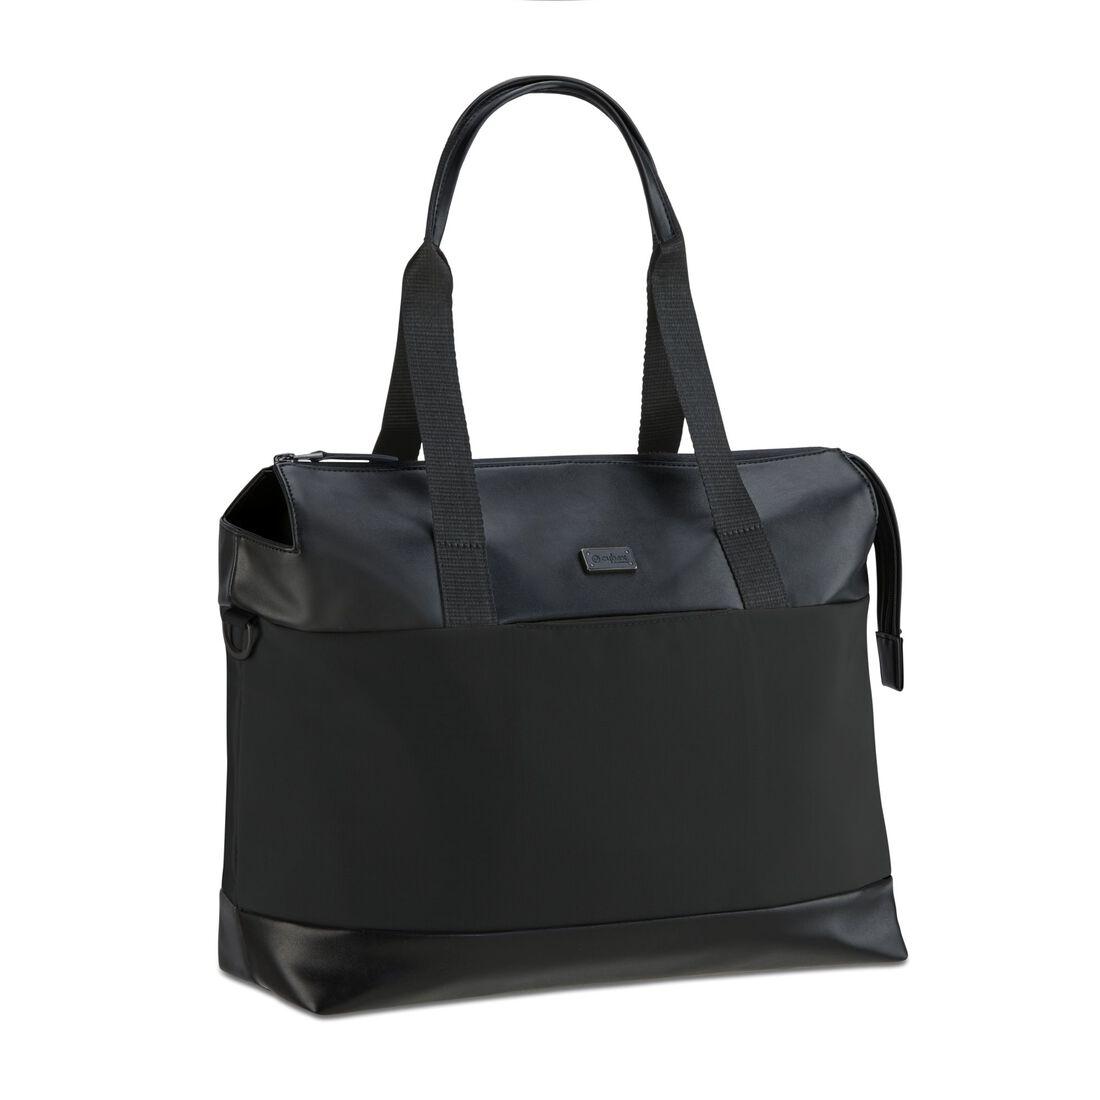 CYBEX Mios Changing Bag - Deep Black in Deep Black large image number 1